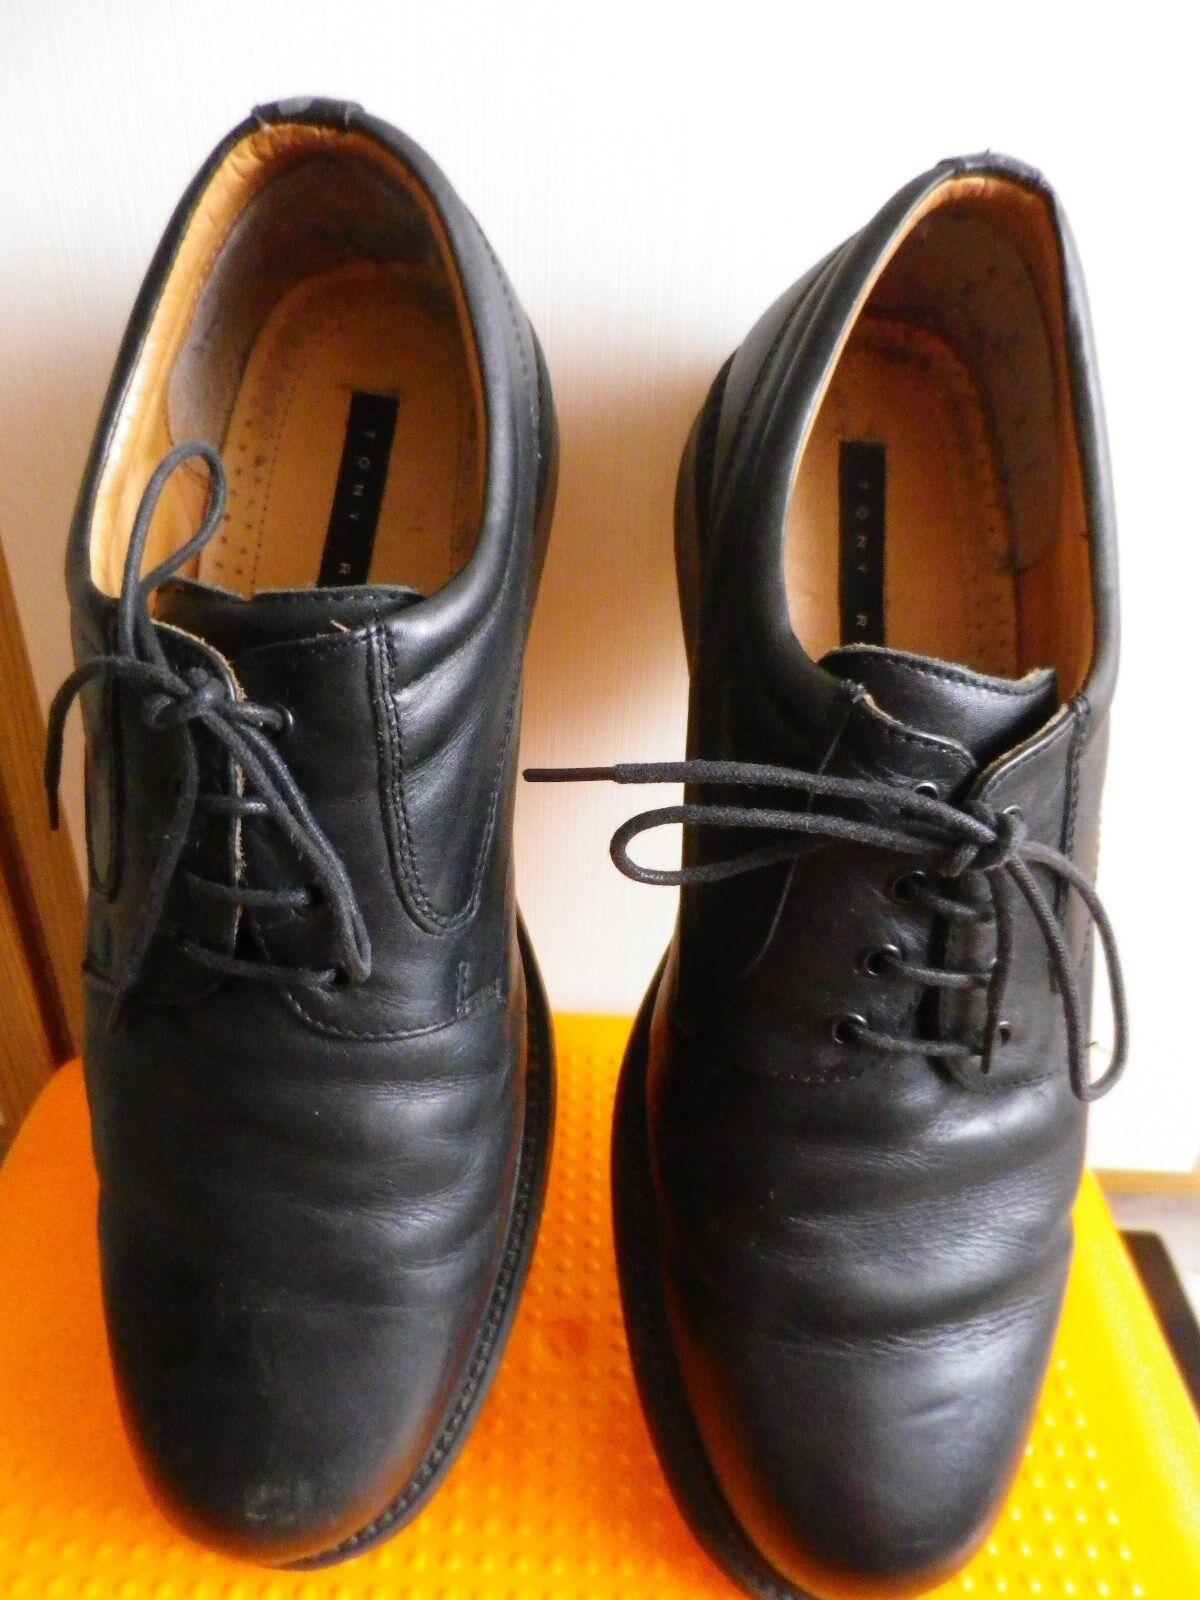 Tony Raff 44) Herrenschuhe Größe 45 (evtl. 44) Raff schwarz SH-04-06 Leder 31 cm Sohlenl. 439861